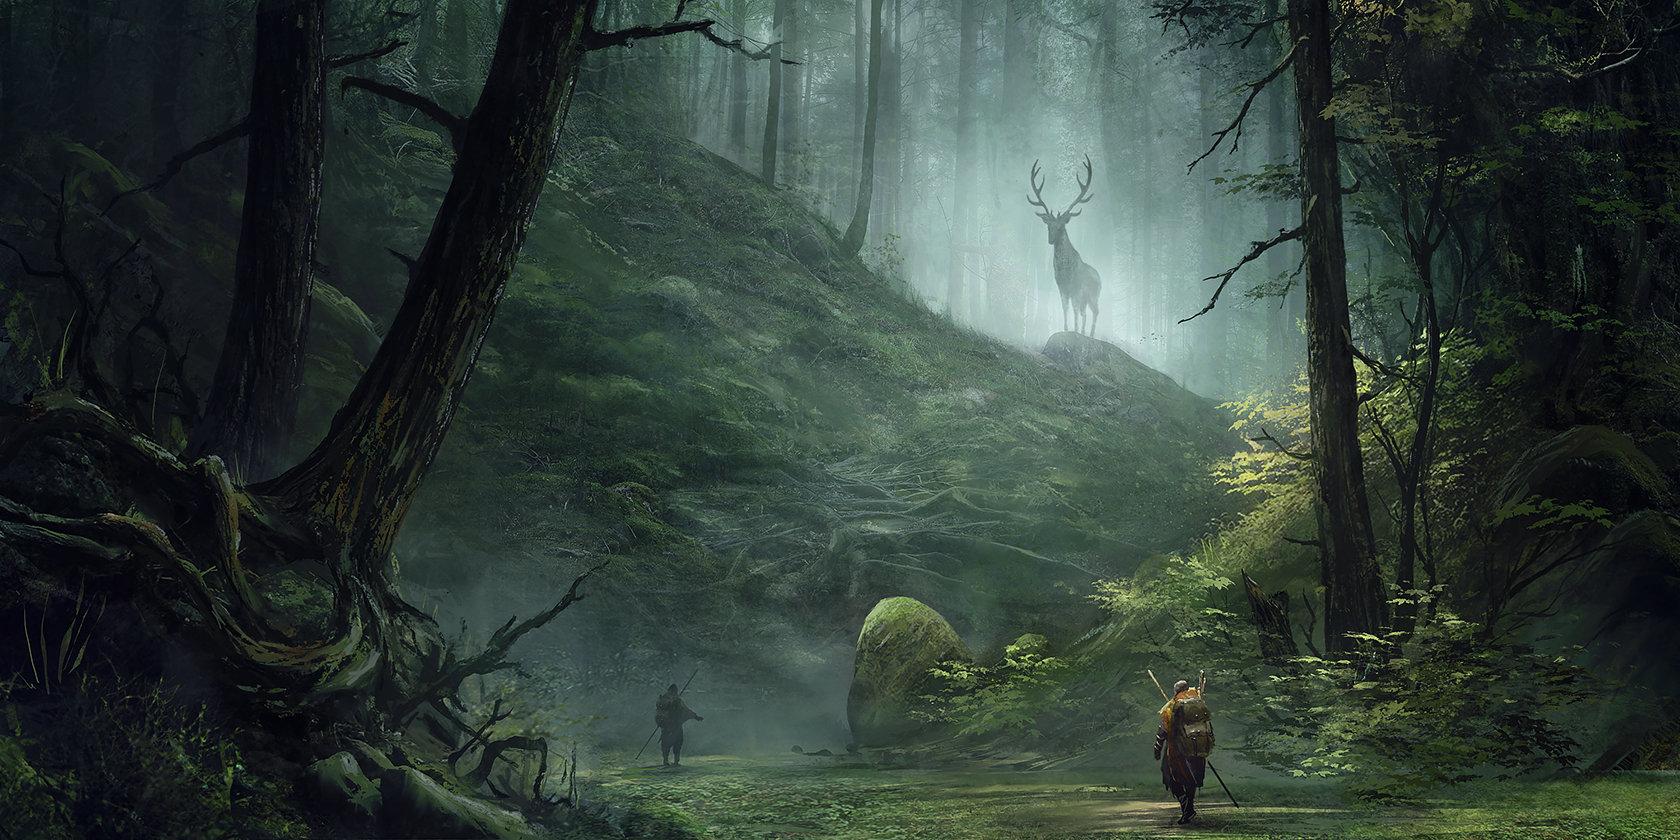 Artstation - Meeting In Woods Sergey Averkin